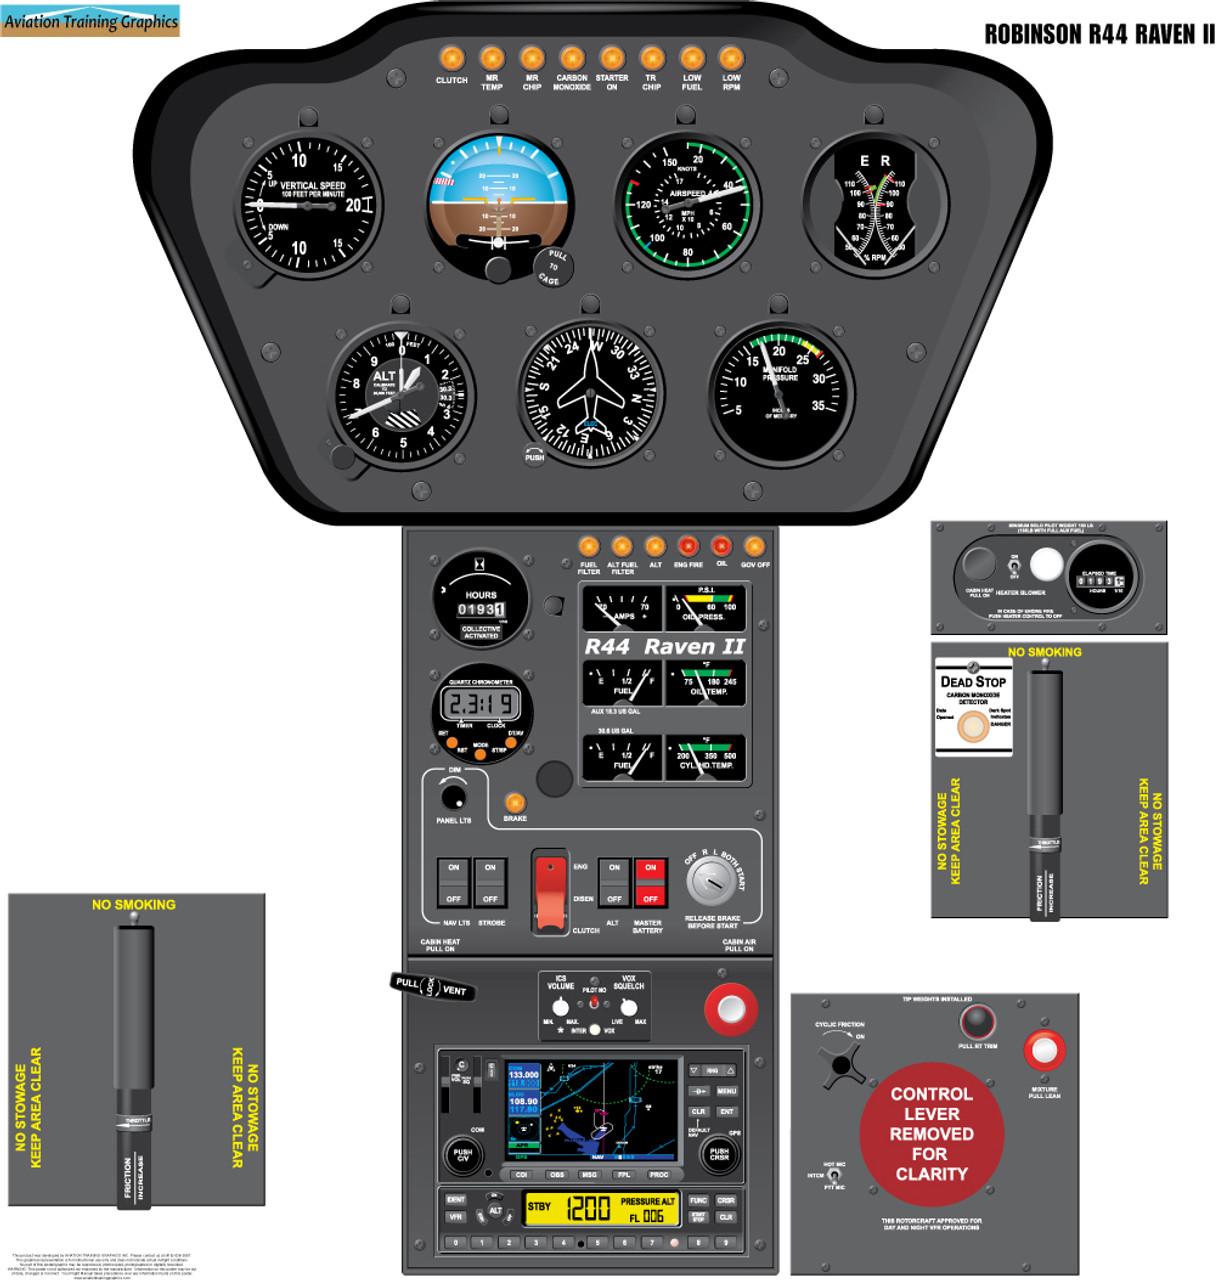 Robinson R44 Raven II Poster